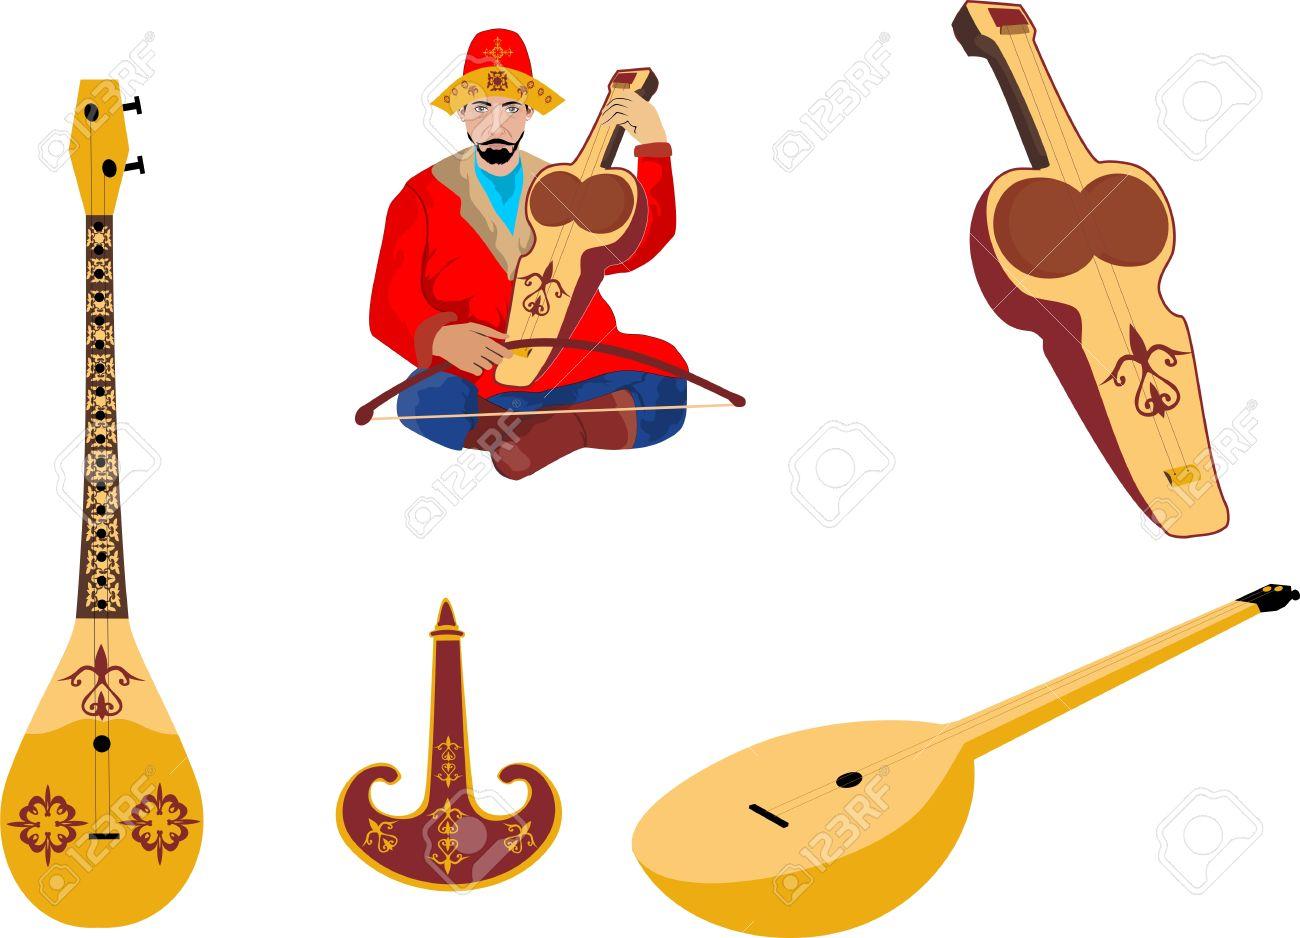 Kazakh Traditional Folk Musiacal Instruments Icons Set Royalty.